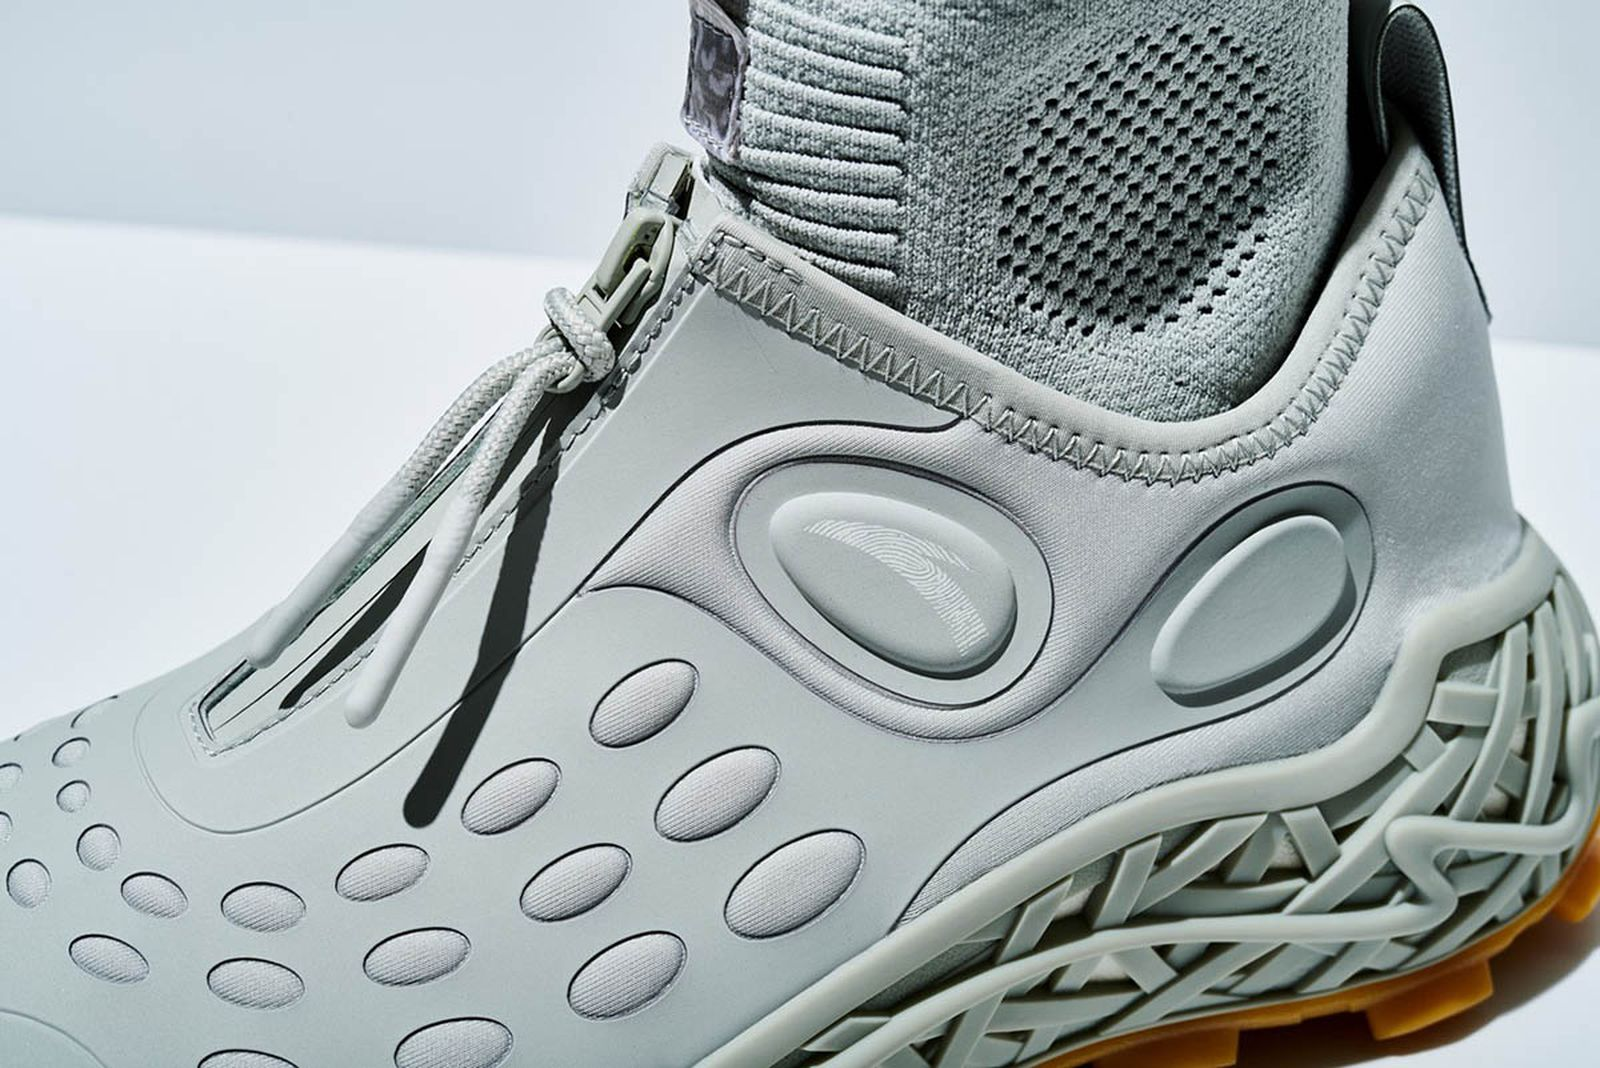 salehe-bembury-anta-sports-release-date-price-03